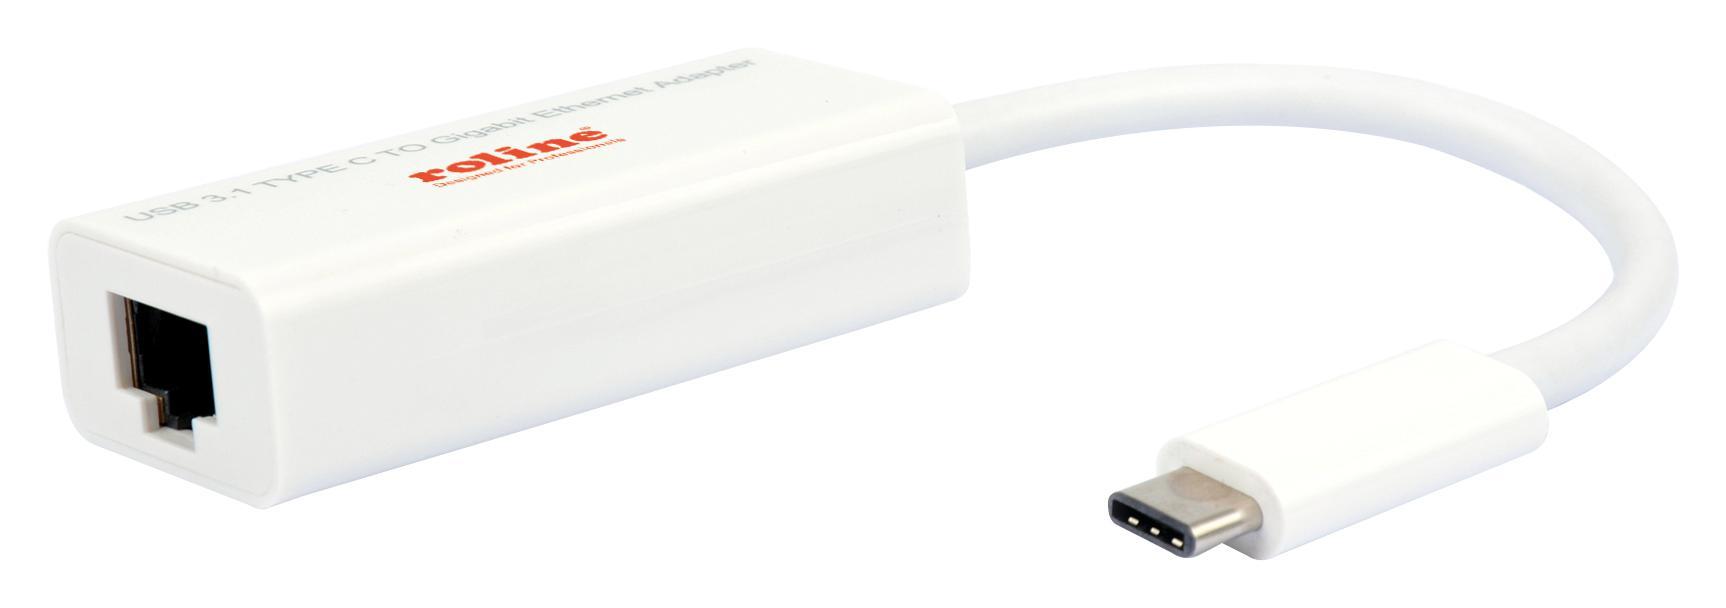 ROLINE USB3.1 TYPE C-GIGABIT ETHERNET CONVERTER